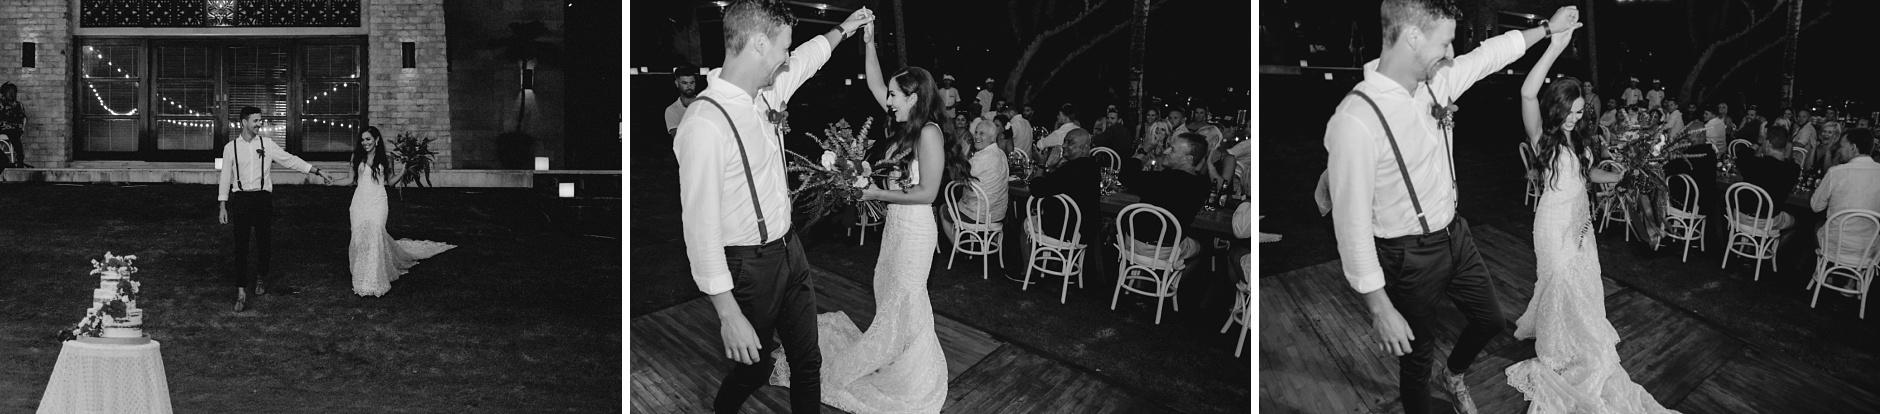 breanna&dan0539b_Bali-Wedding-Photographer.jpg